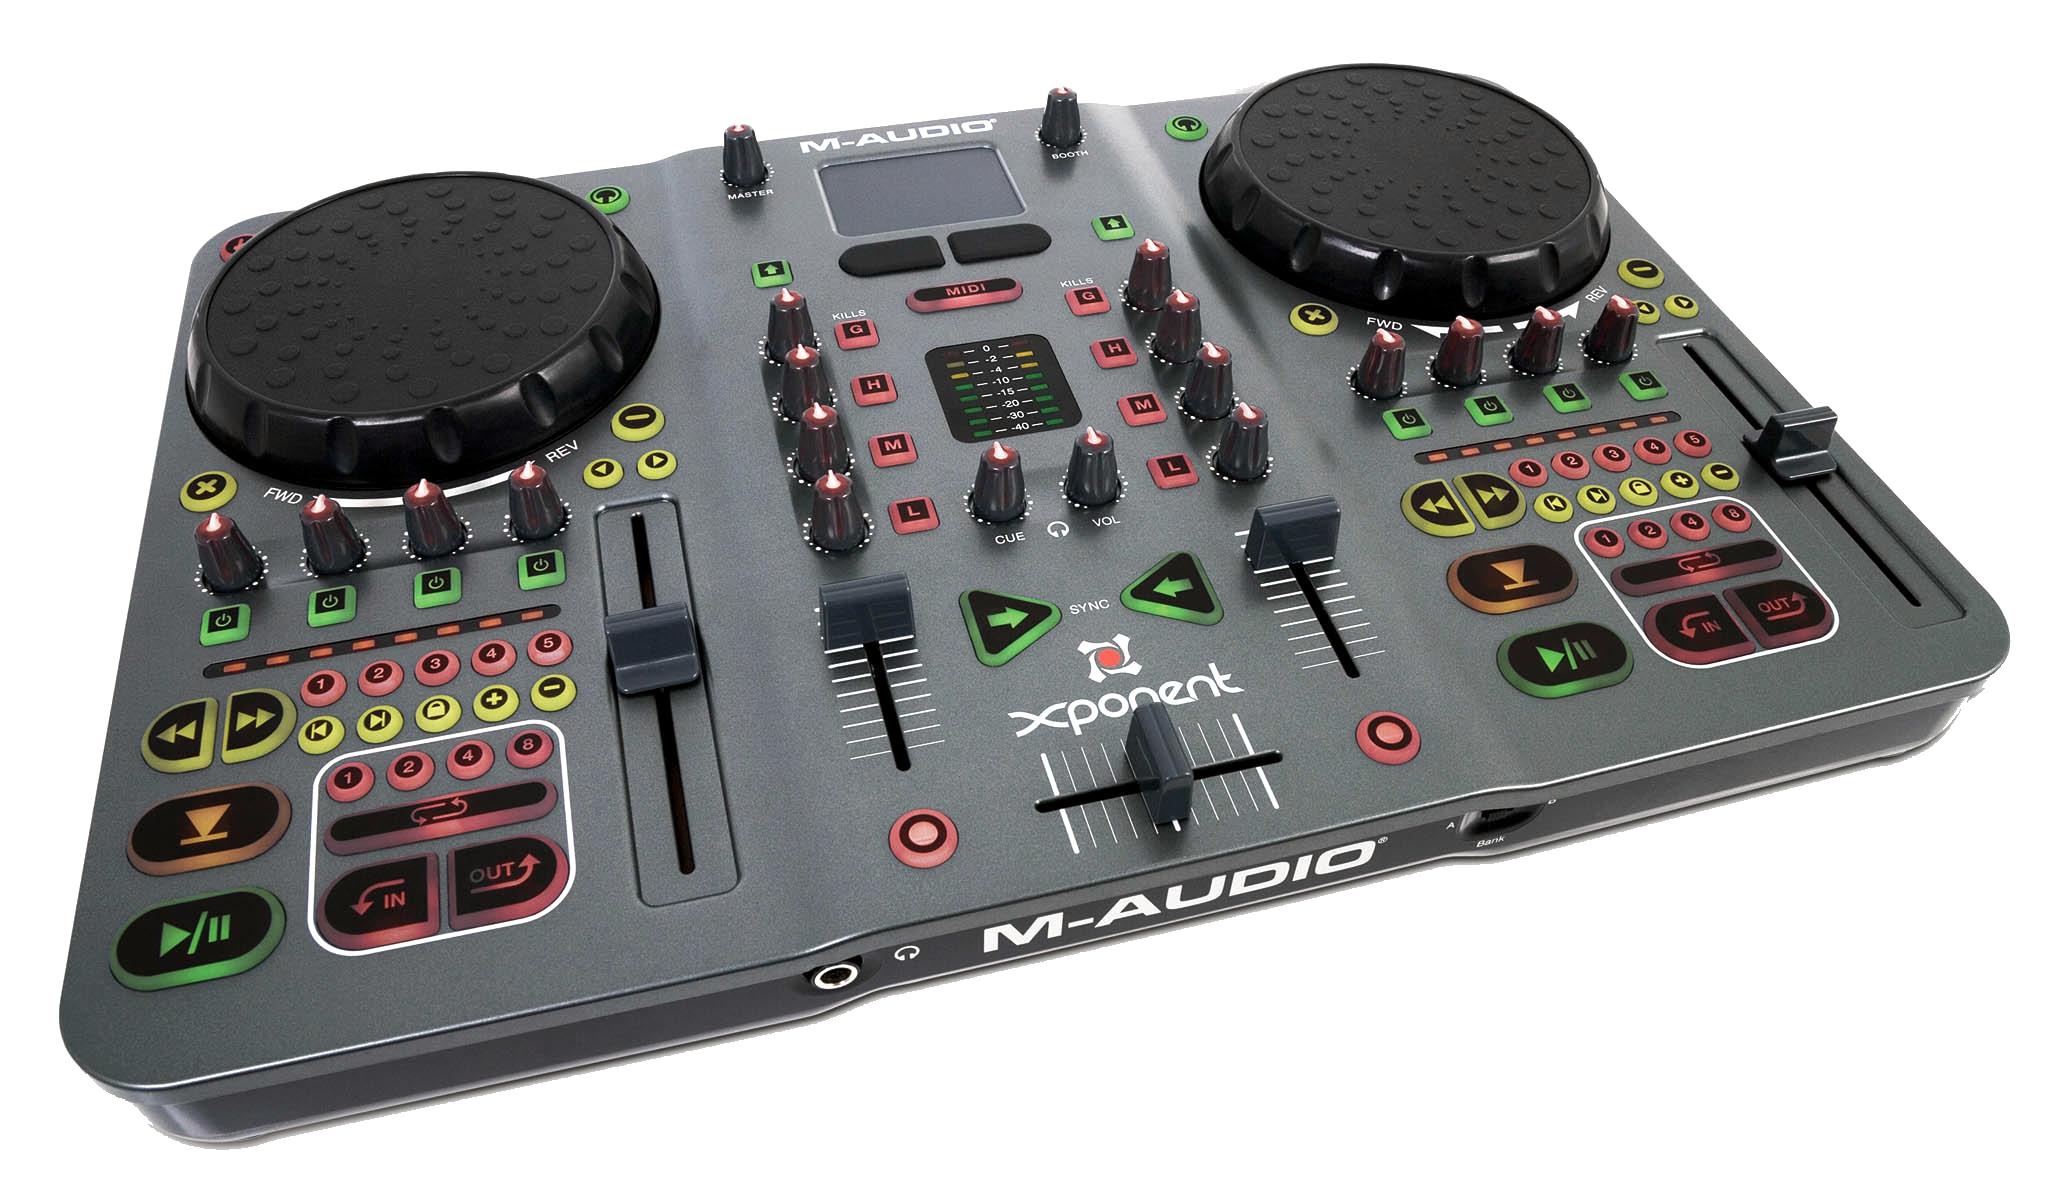 M-Audio Xponent - Controlador para DJs